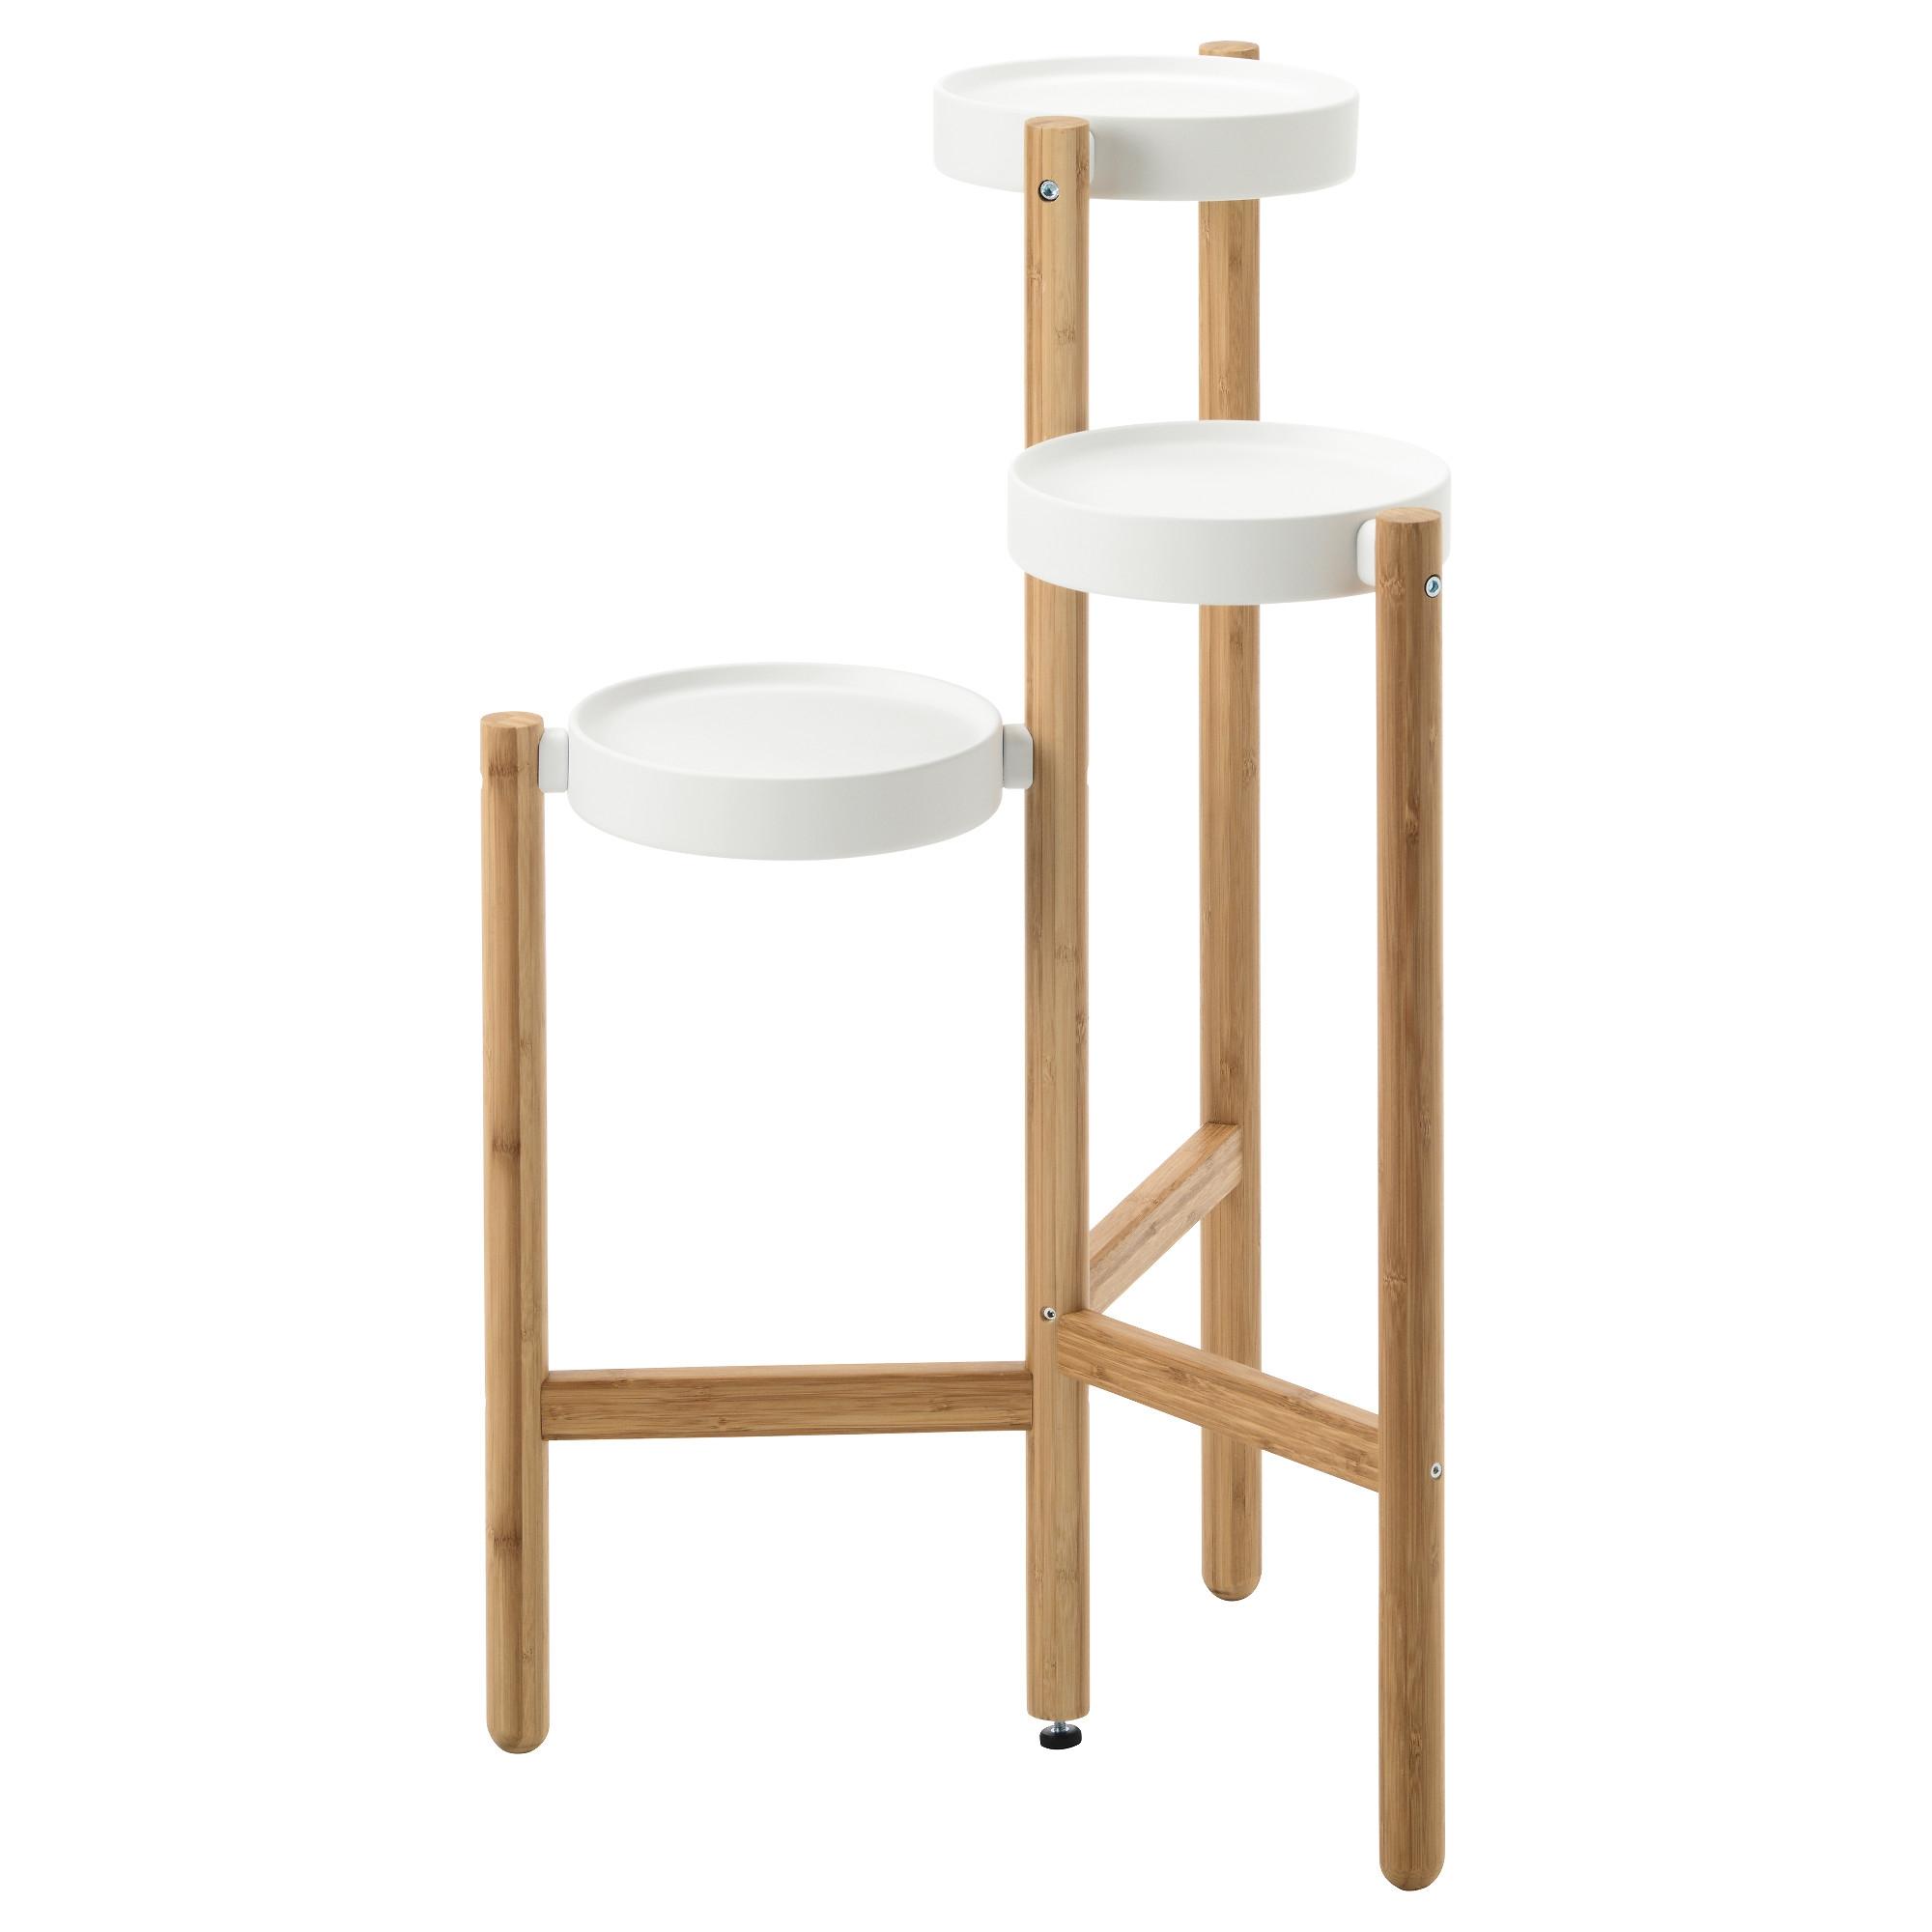 Satsumas pedestal para plantas - Pedestal para plantas ...